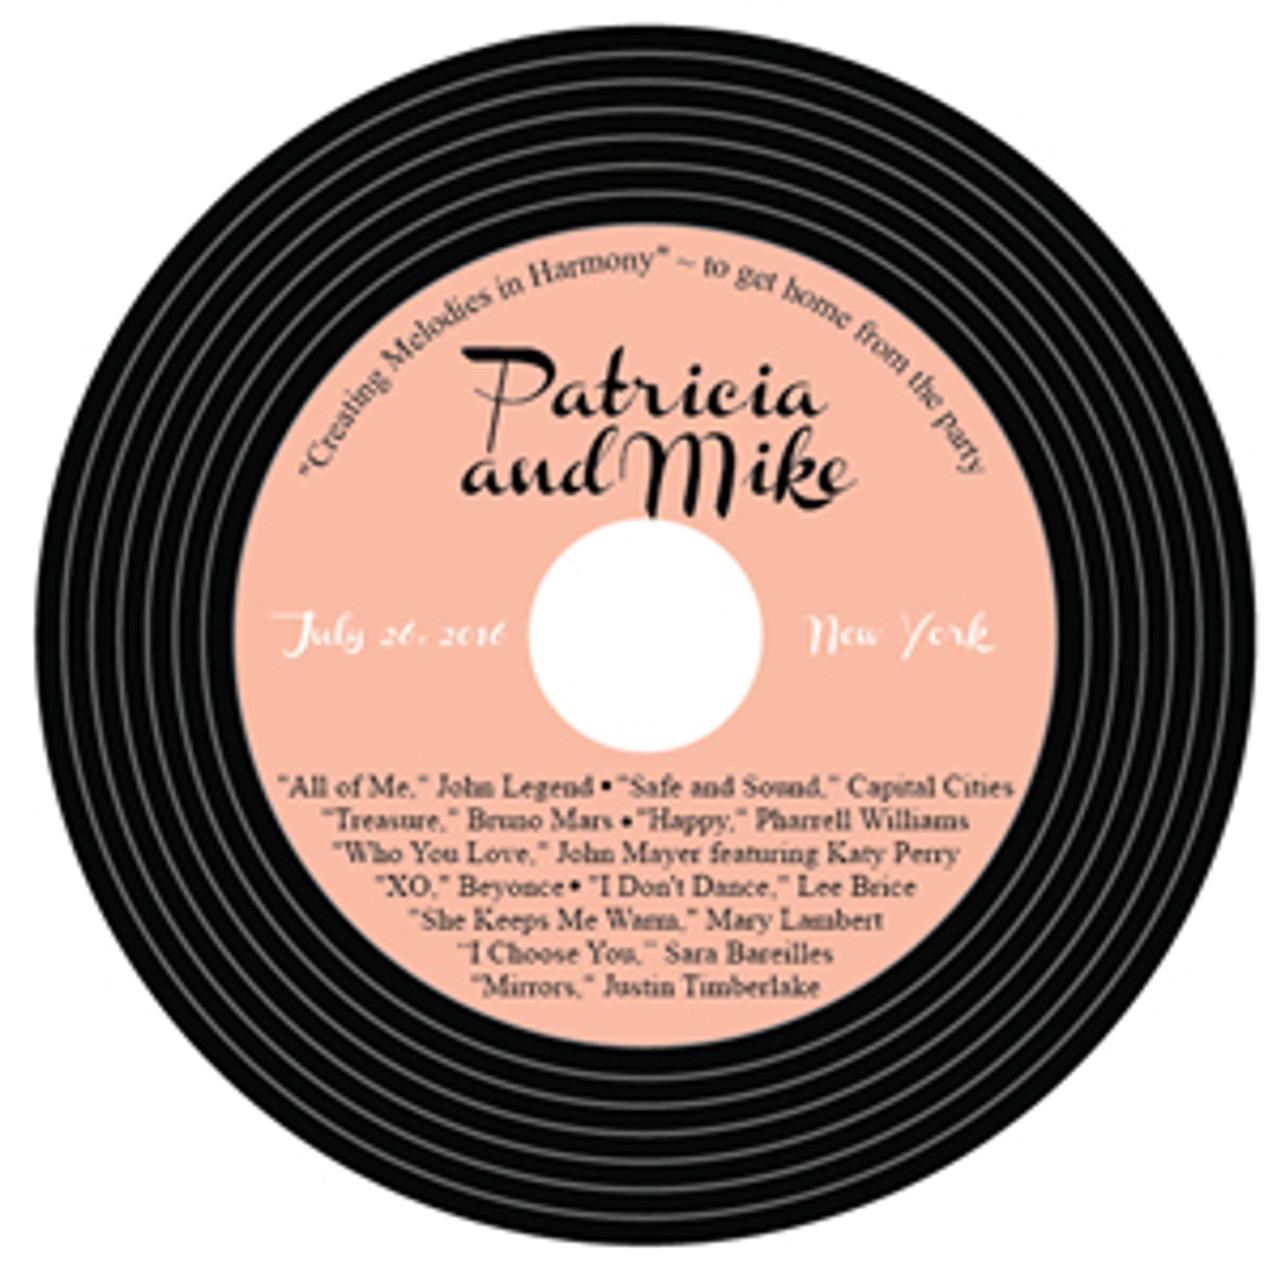 personalized vintage record vinyl